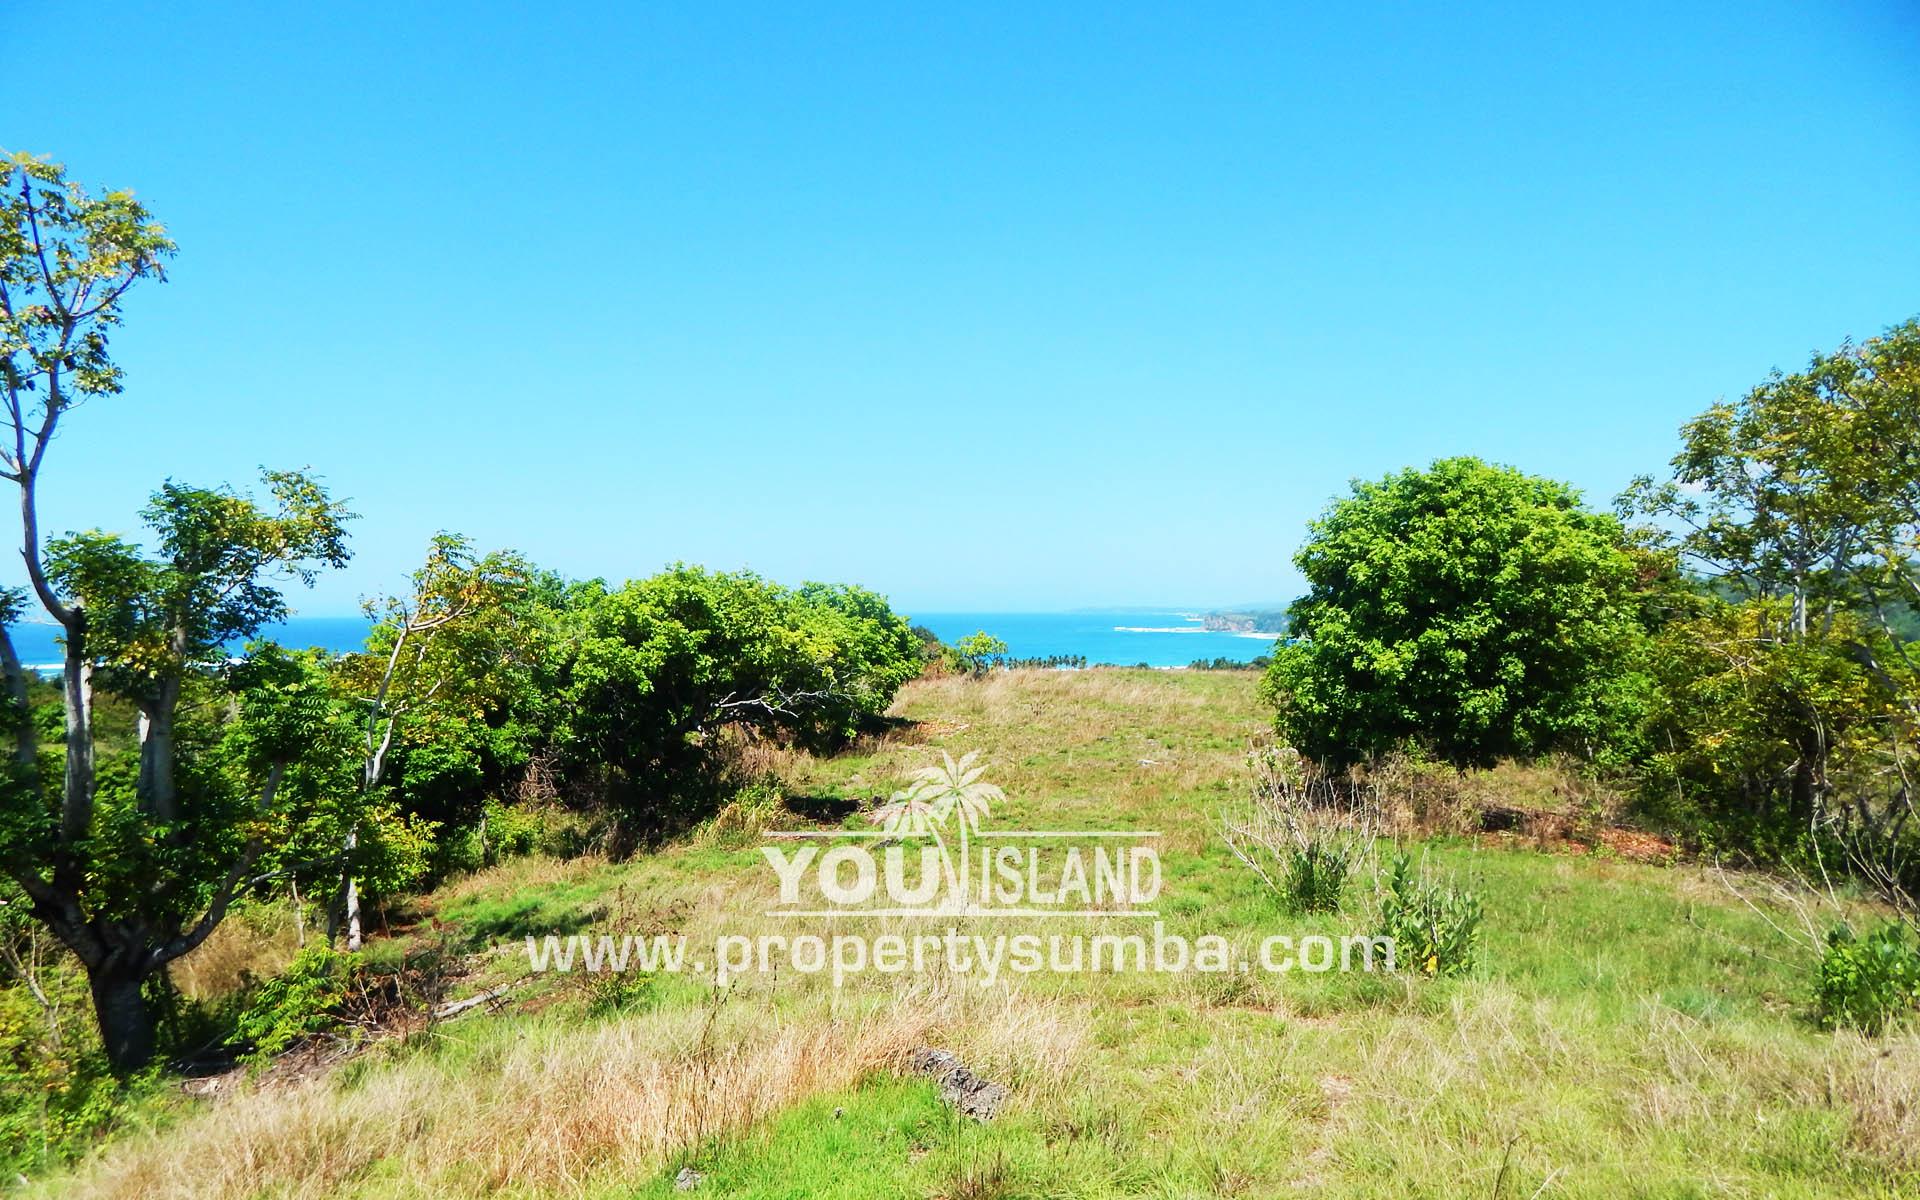 Property Sumba Dangla Rada 523 3057m2 4